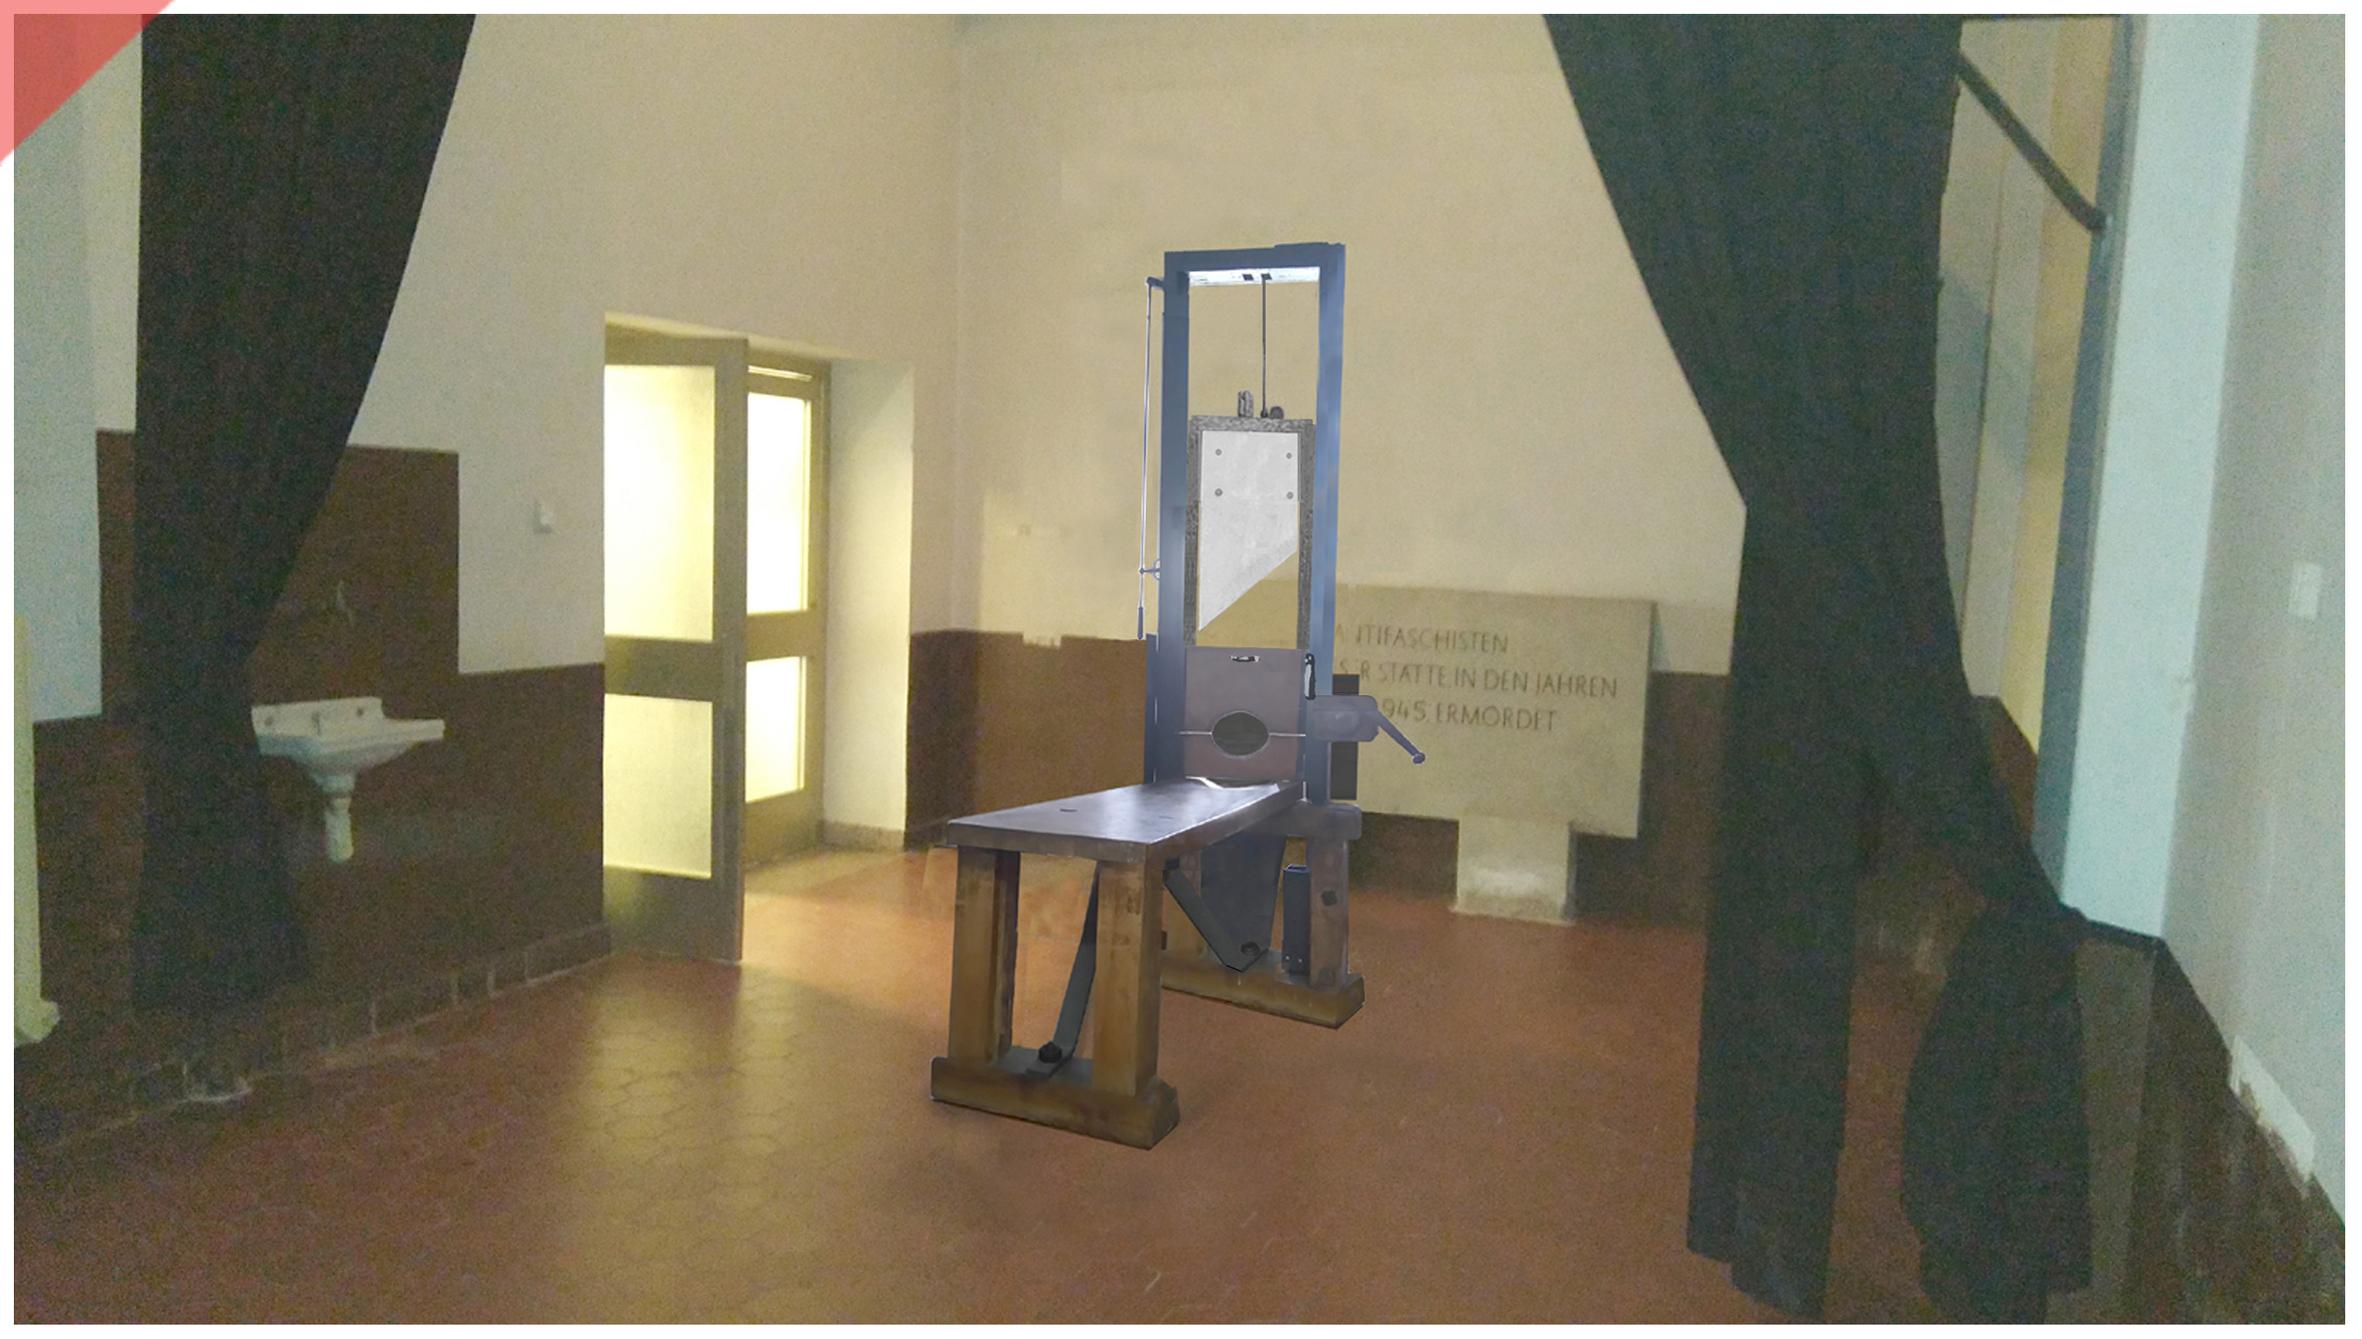 Brandenburg-Görden-Goerden-prison-room-present-German-Fallbeil-Modell-T-Mannhardt-Guillotine-Röttger-Roettger-Garage